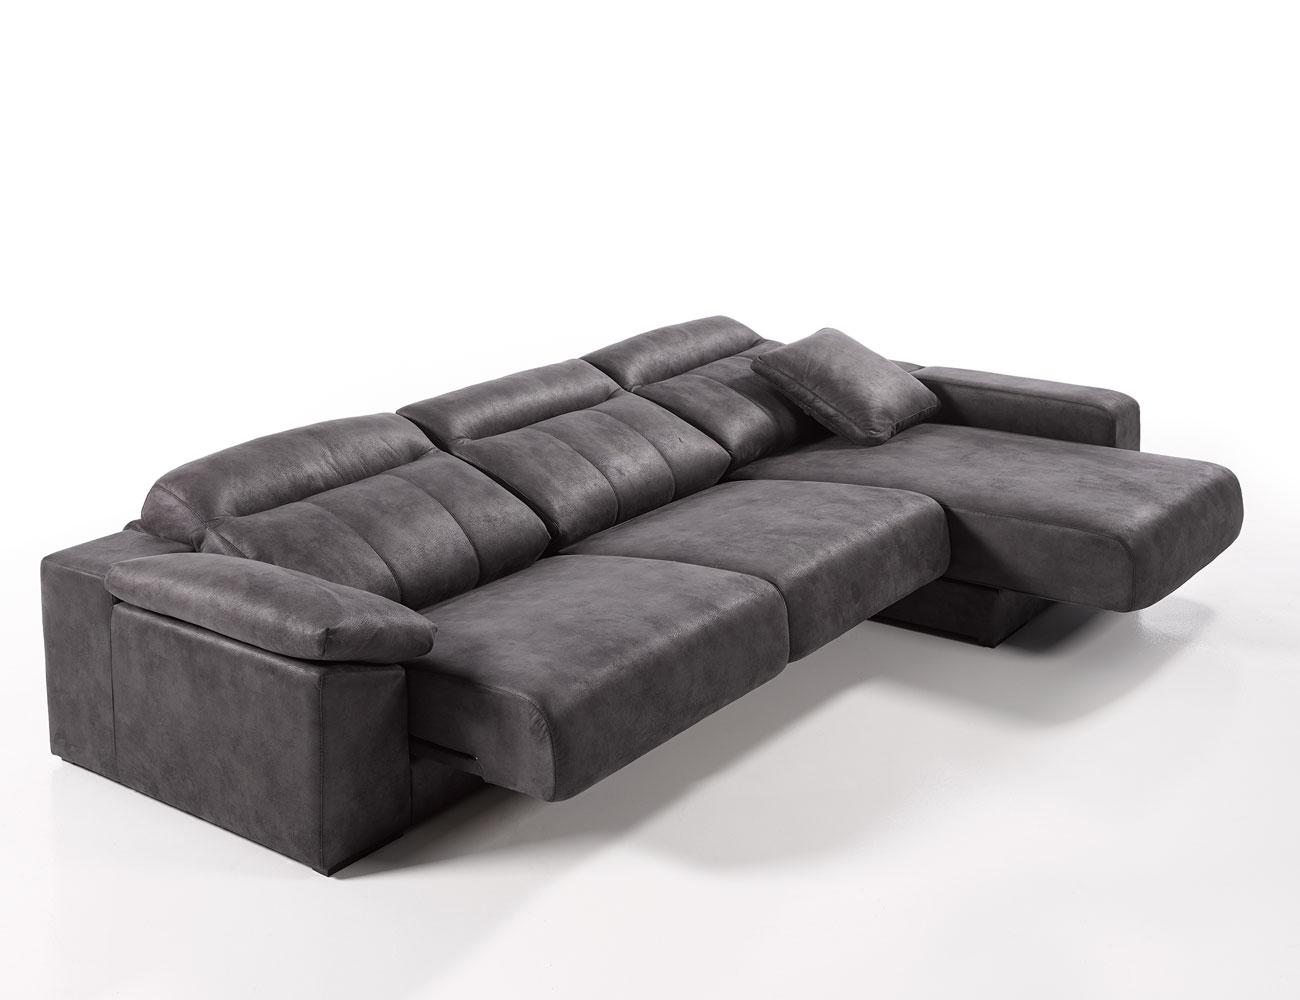 Sofa chaiselongue gama alta deslizante